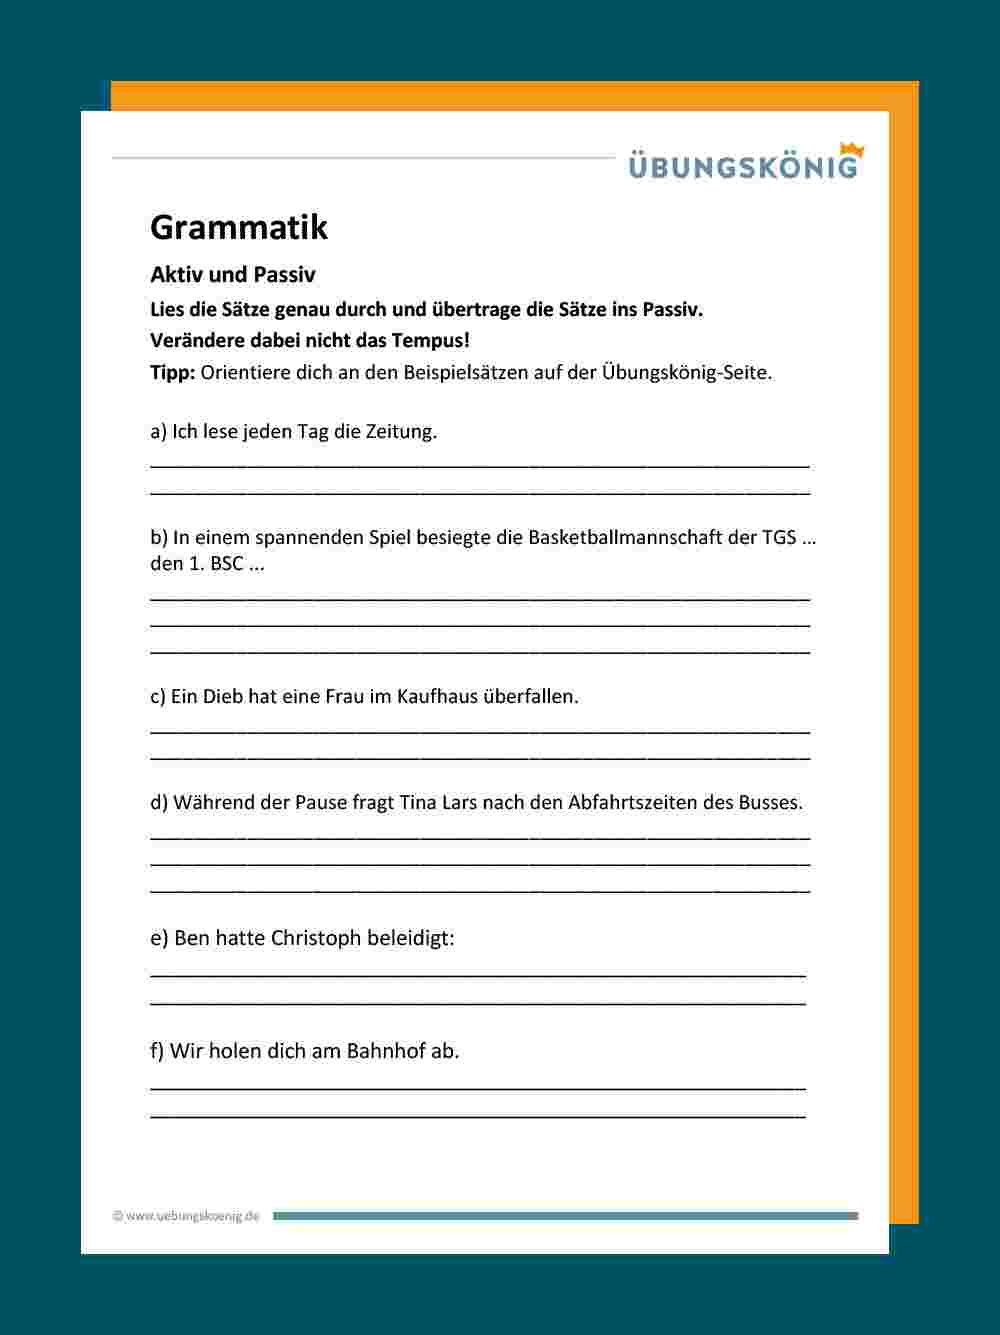 singlebörse ebersberg wochenhoroskop fische frau single